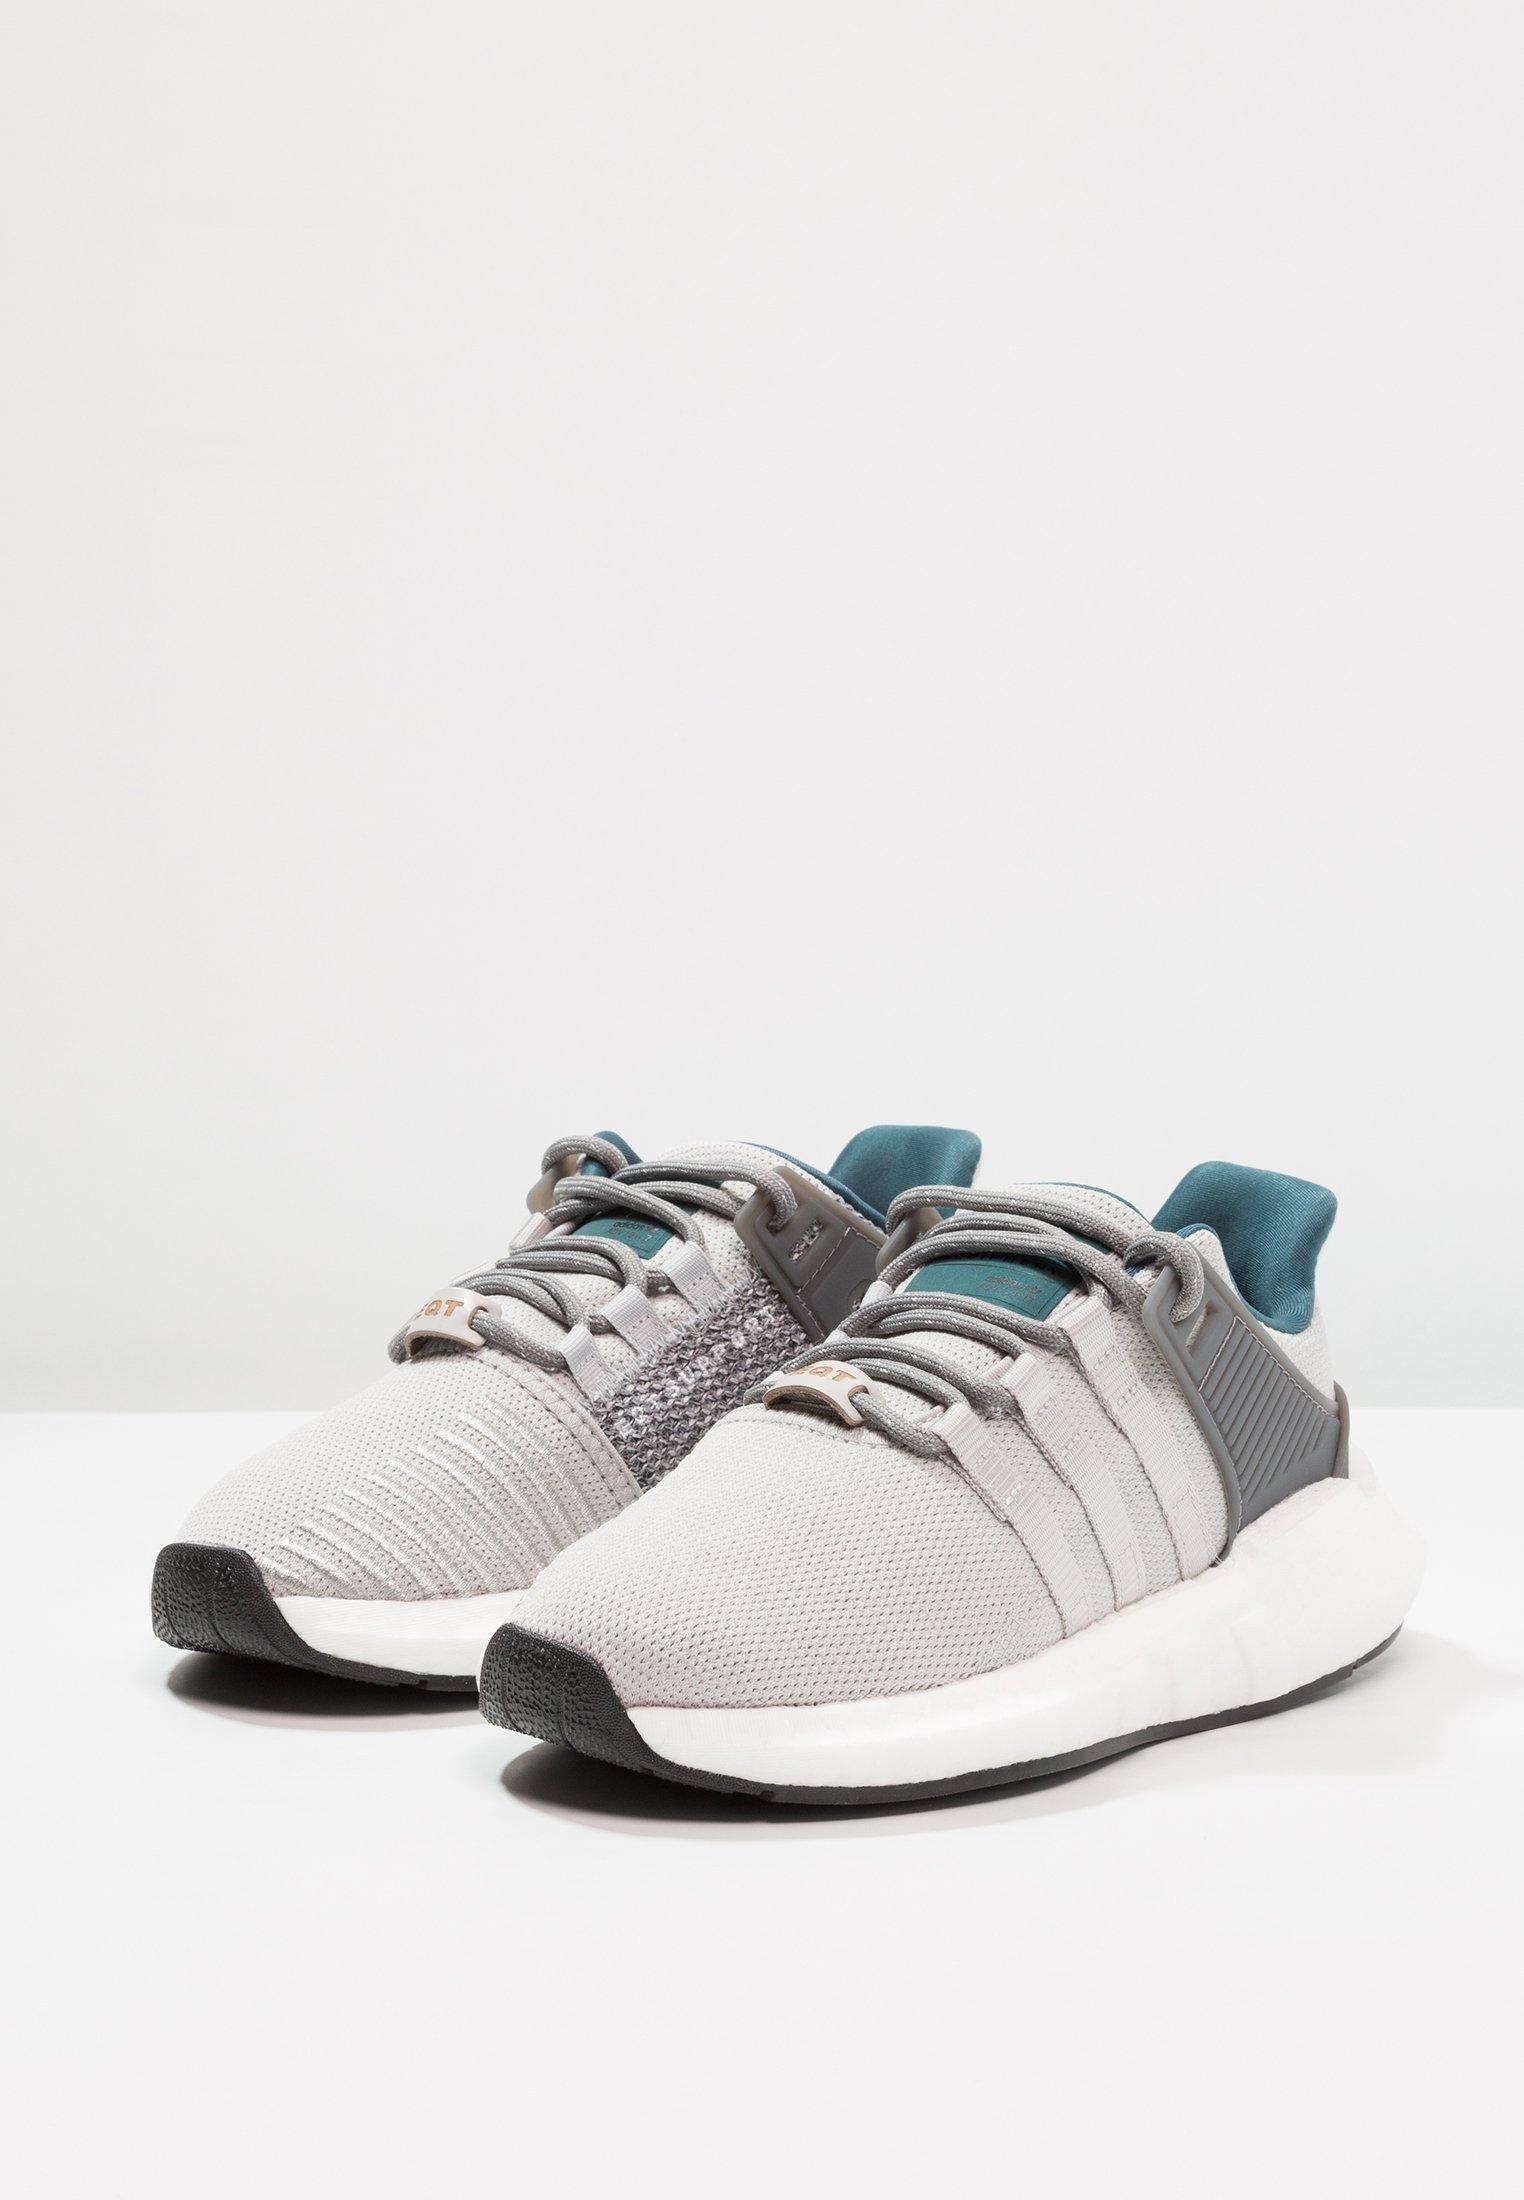 adidas Originals EQT SUPPORT 93/17 - Sneaker low - grey two/grey three - Black Friday